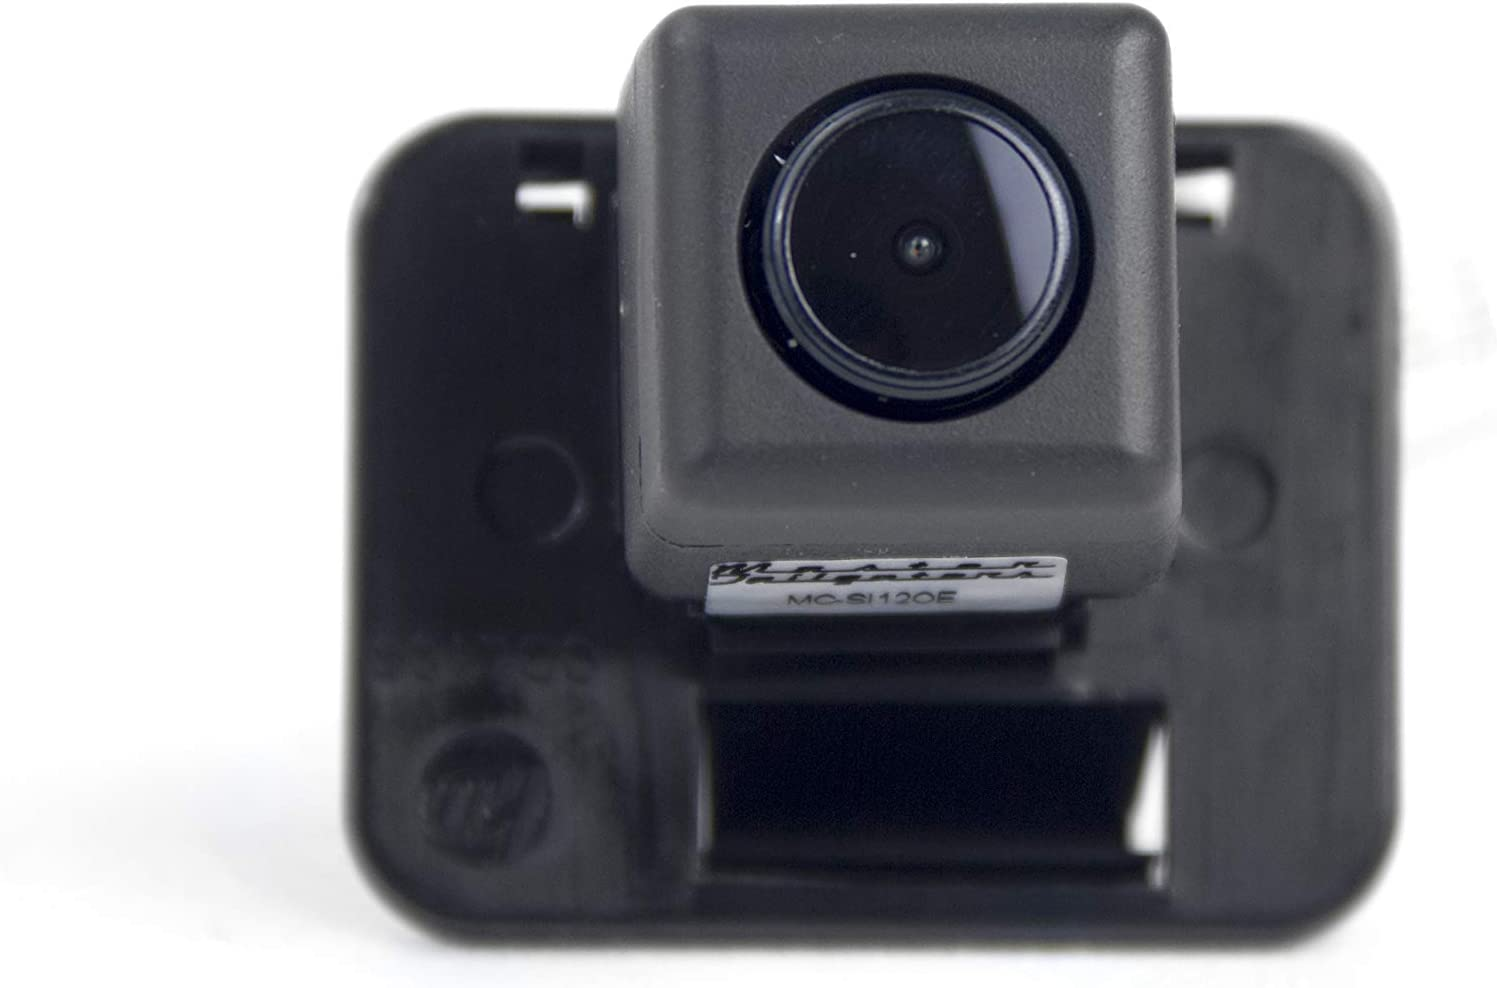 2014 2013-2014 2012-2014 Backup Camera OE Part # 86267FJ000 Master Tailgaters Replacement for Subaru Imprezza Wagon Sedan//Crosstrek Crosstrek Hybrid